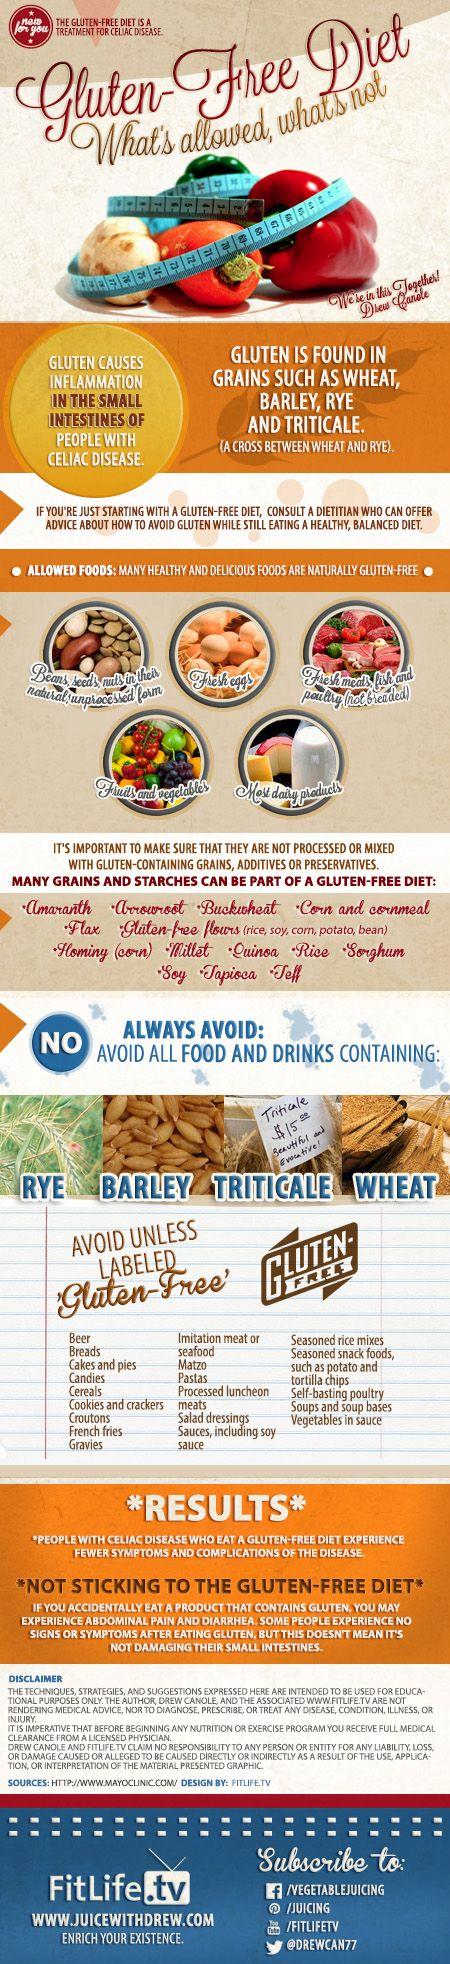 gluten free diet not allowed